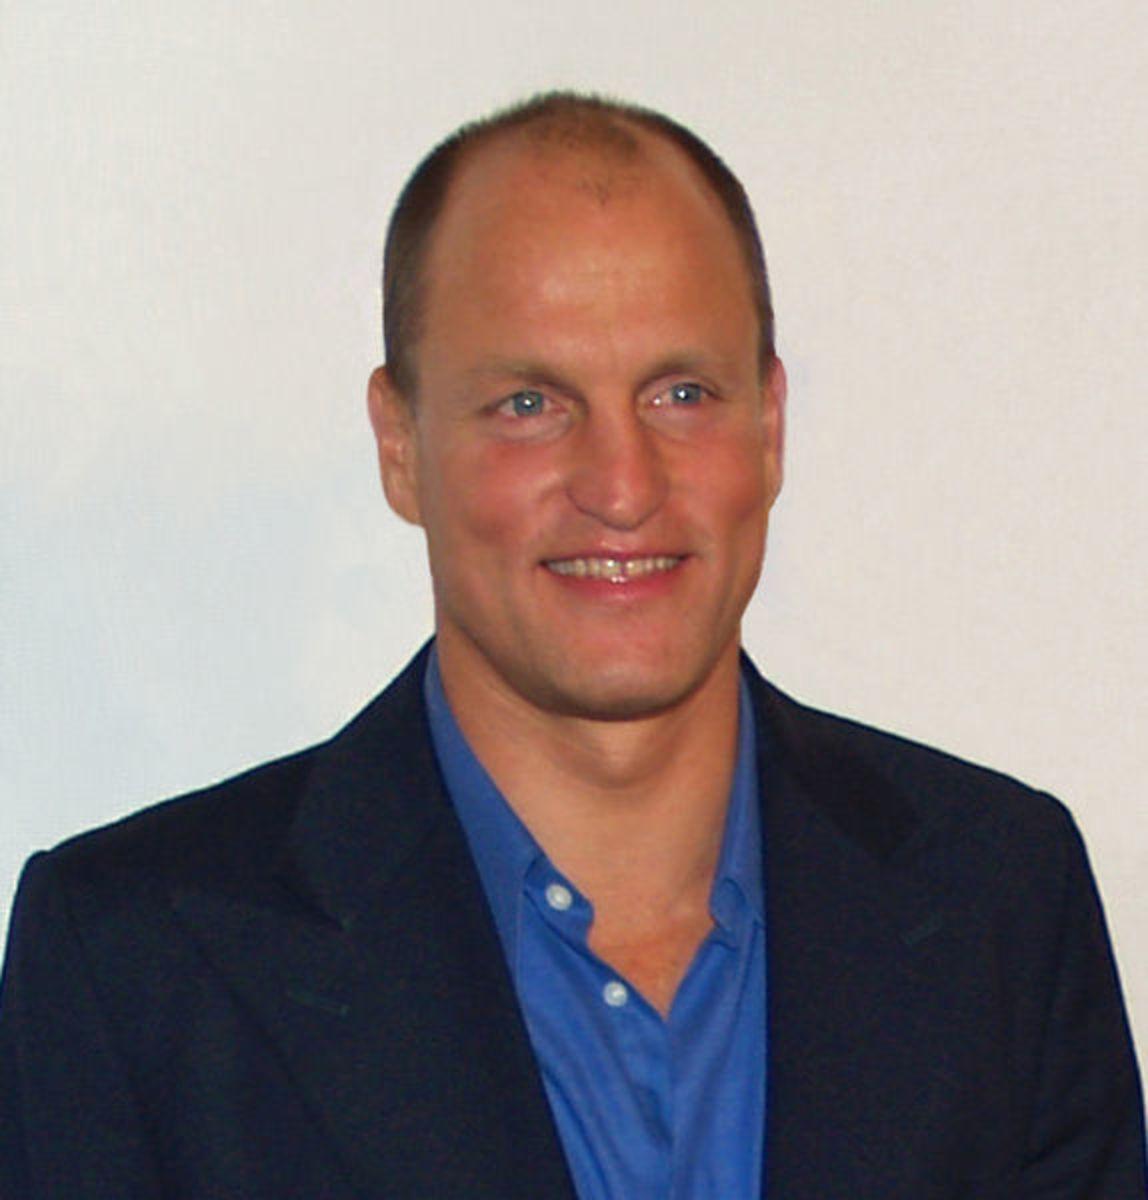 Woody Harrelson, 2007